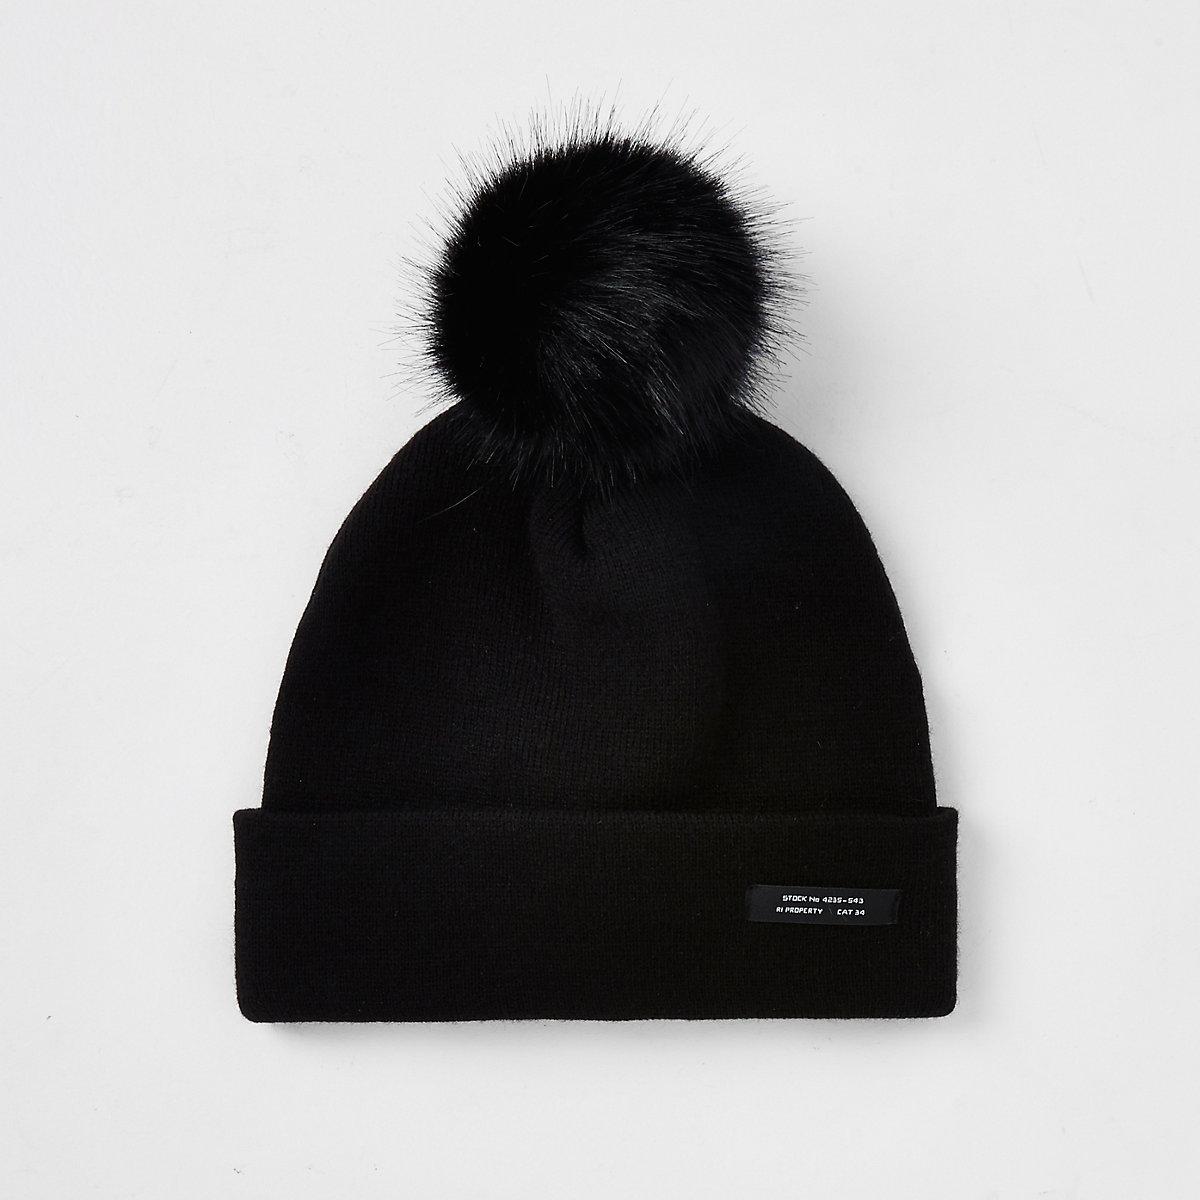 Boys black slouch beanie hat - Hats - Accessories - boys c0a53d9a646